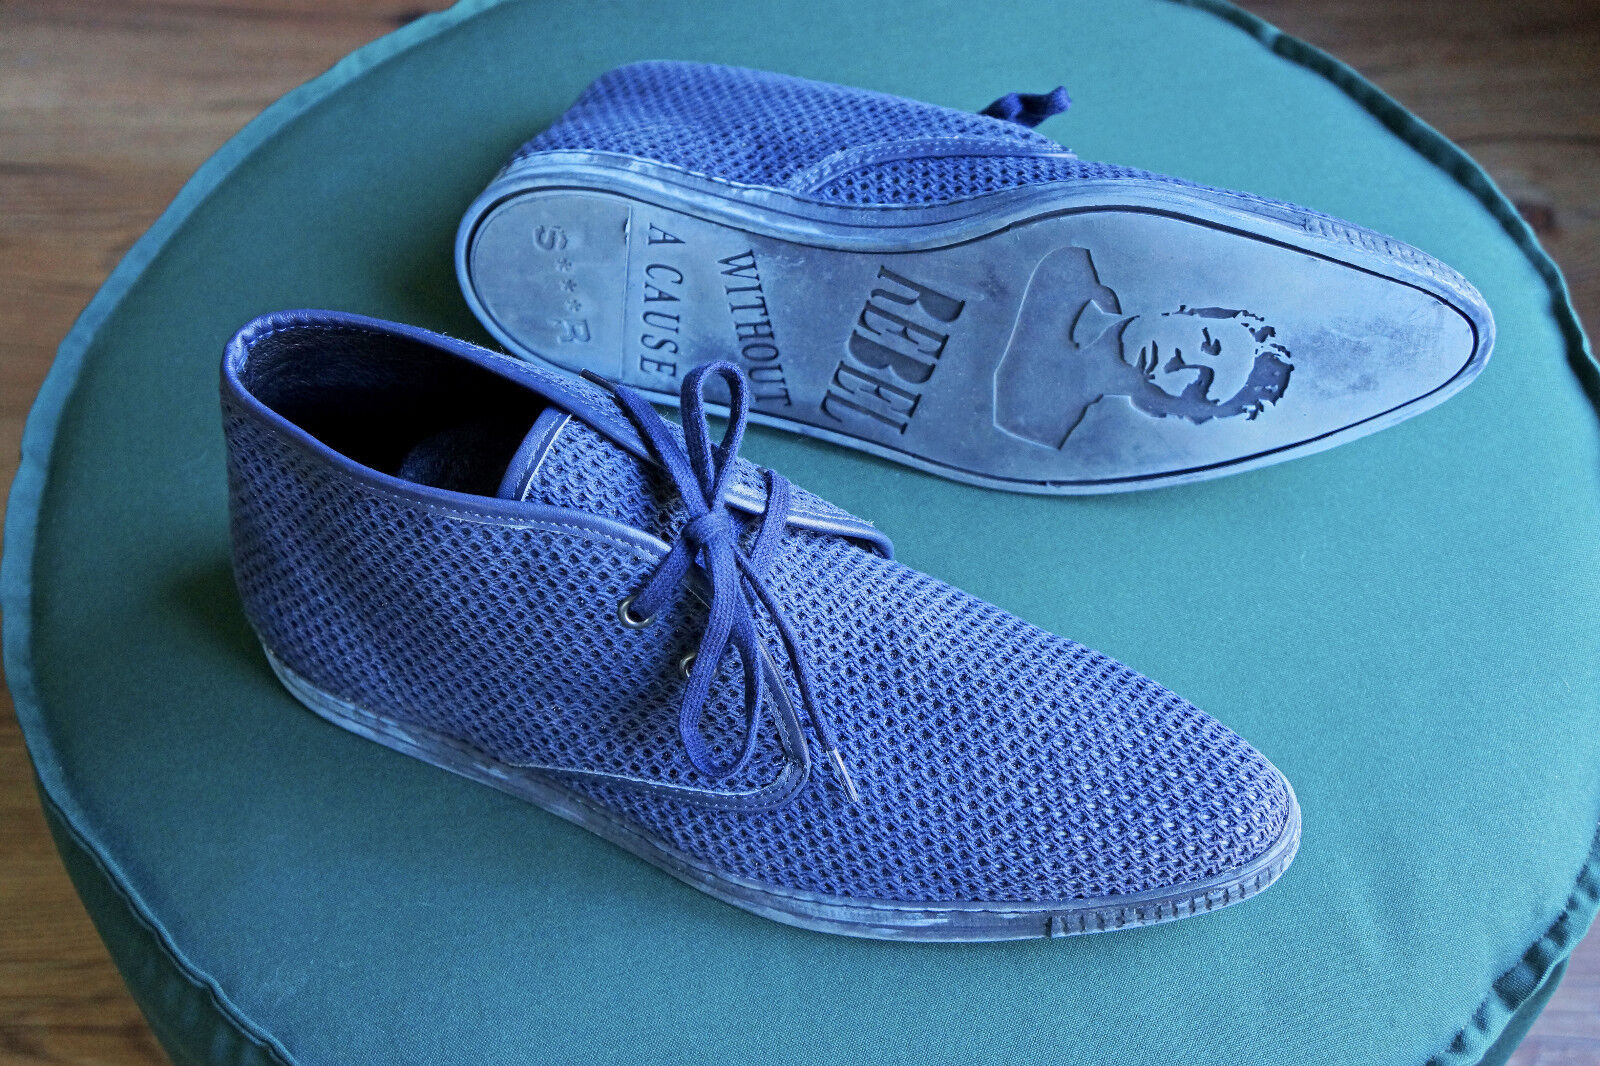 Swear Dean 110 - blau/blue - Größe/Size (EU) 43 - 1x anprobiert - nie getragen